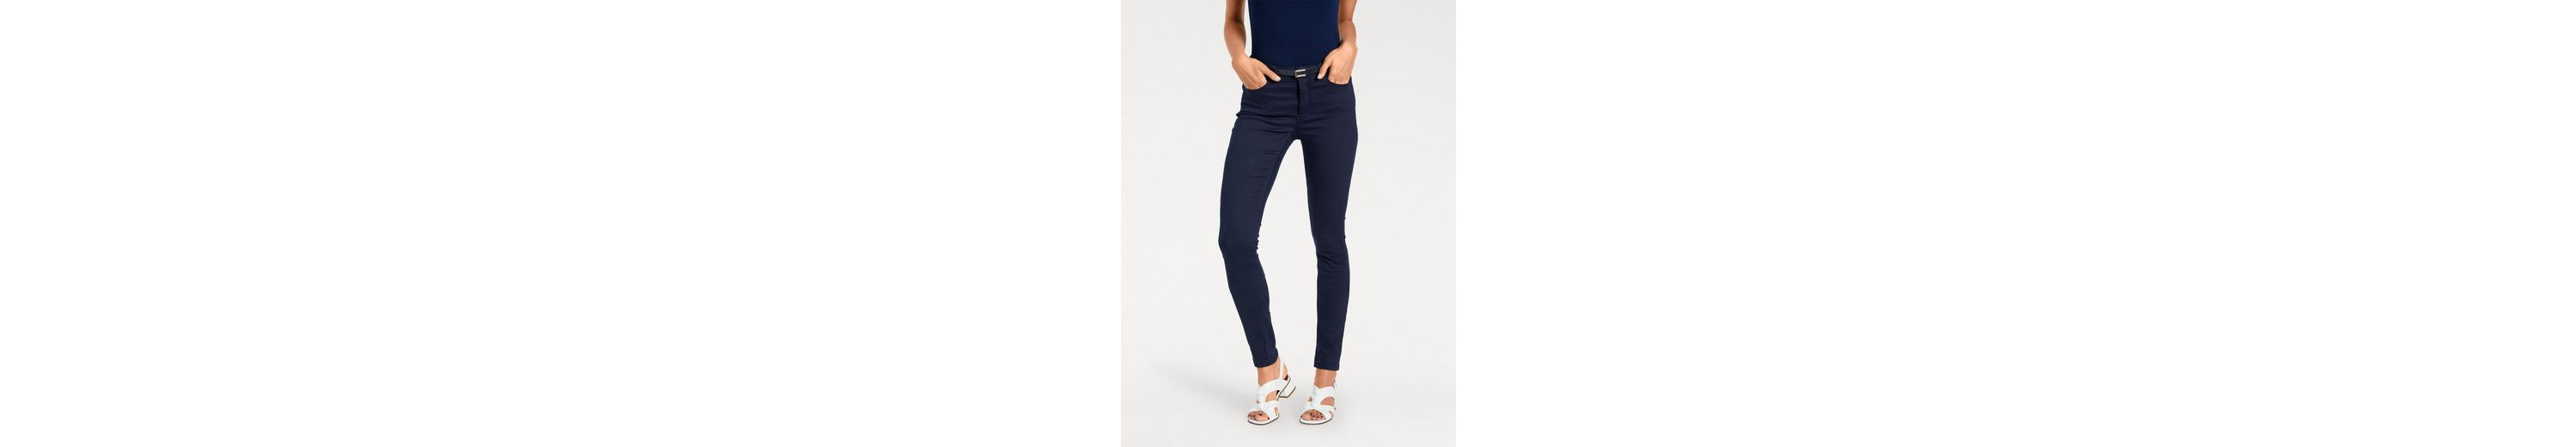 ASHLEY BROOKE by Heine Jeans in Skinny-Form Auslass 100% Garantiert Mode Günstig Online Wahl vxdO4RZ